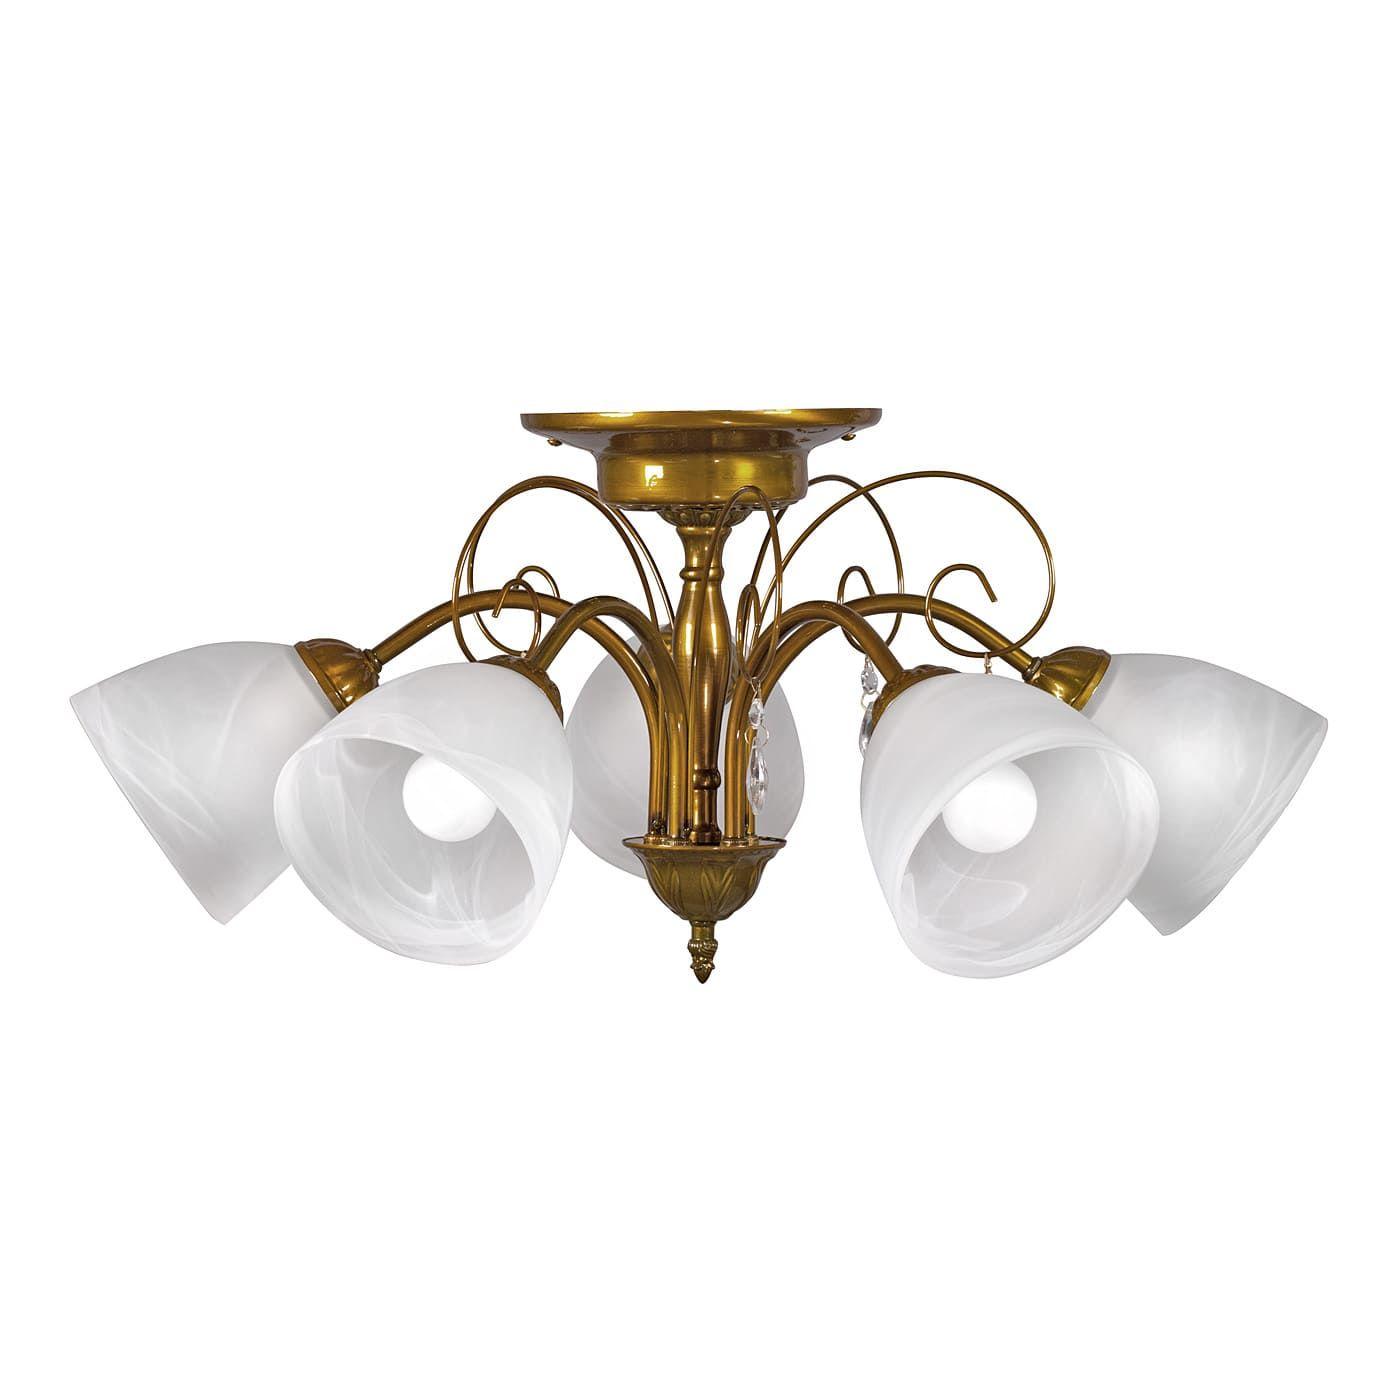 PETRASVET / Ceiling chandelier S2113-5, 5xE27 max. 60W